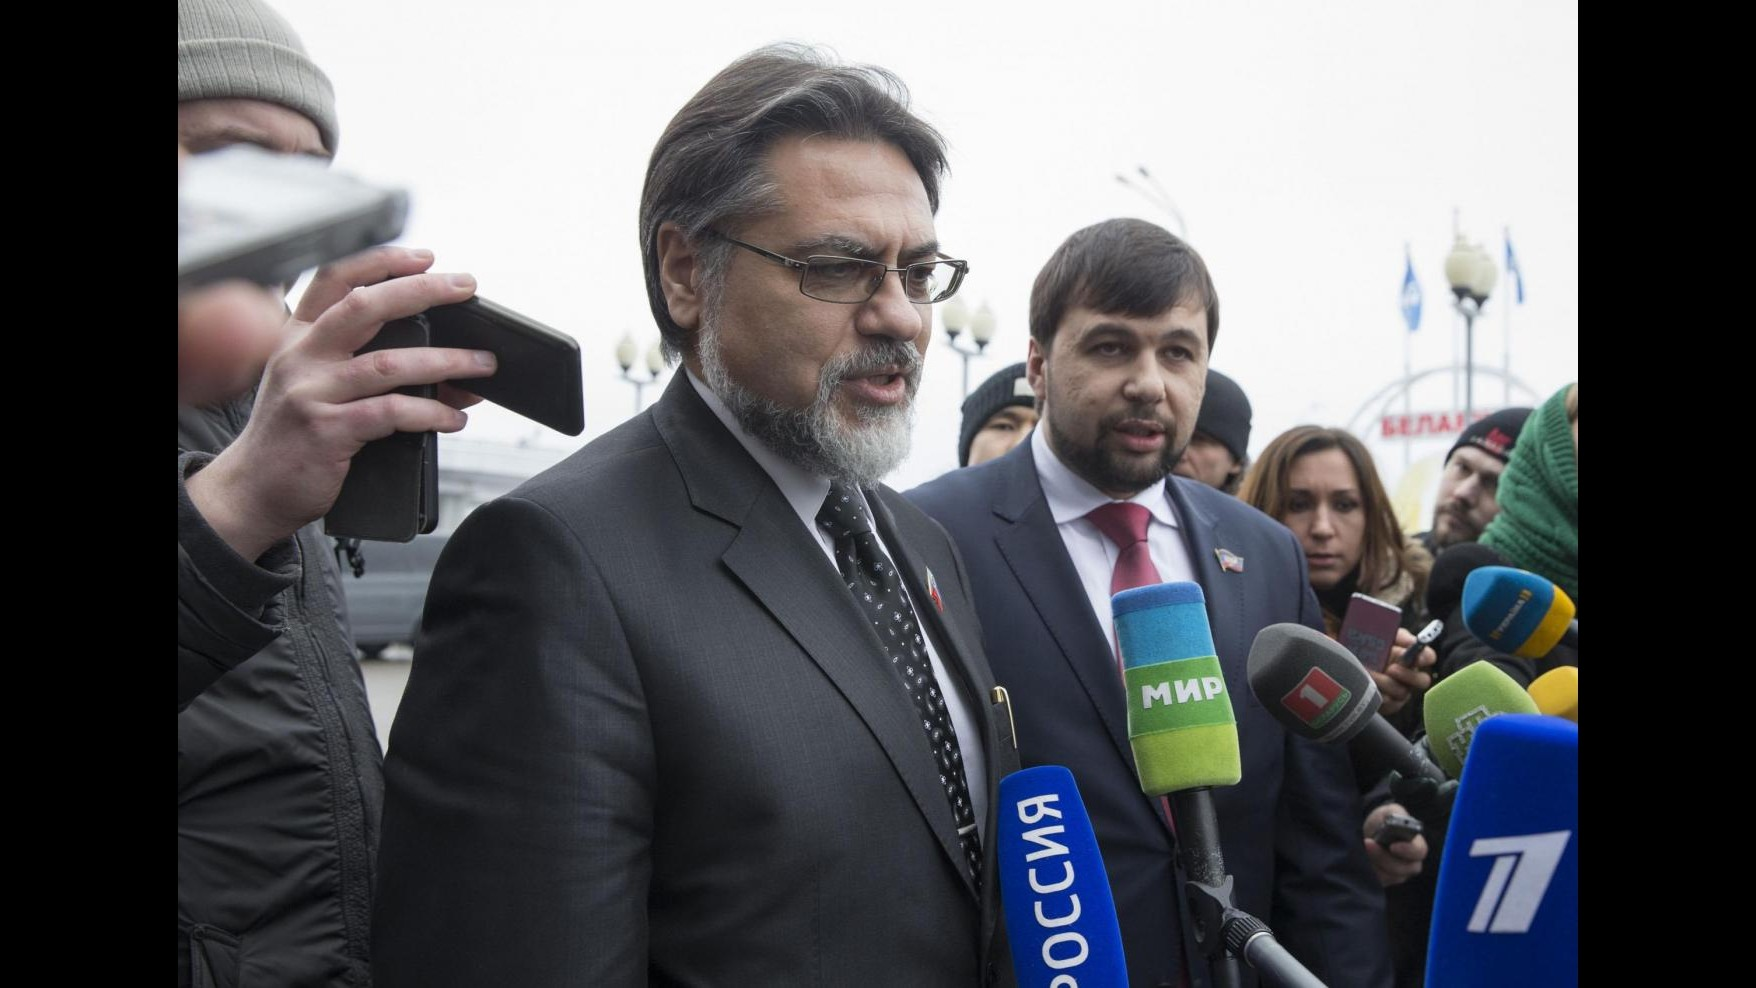 Ucraina, saltano i colloqui di Minsk. Ribelli: Kiev rifiuta dialogo